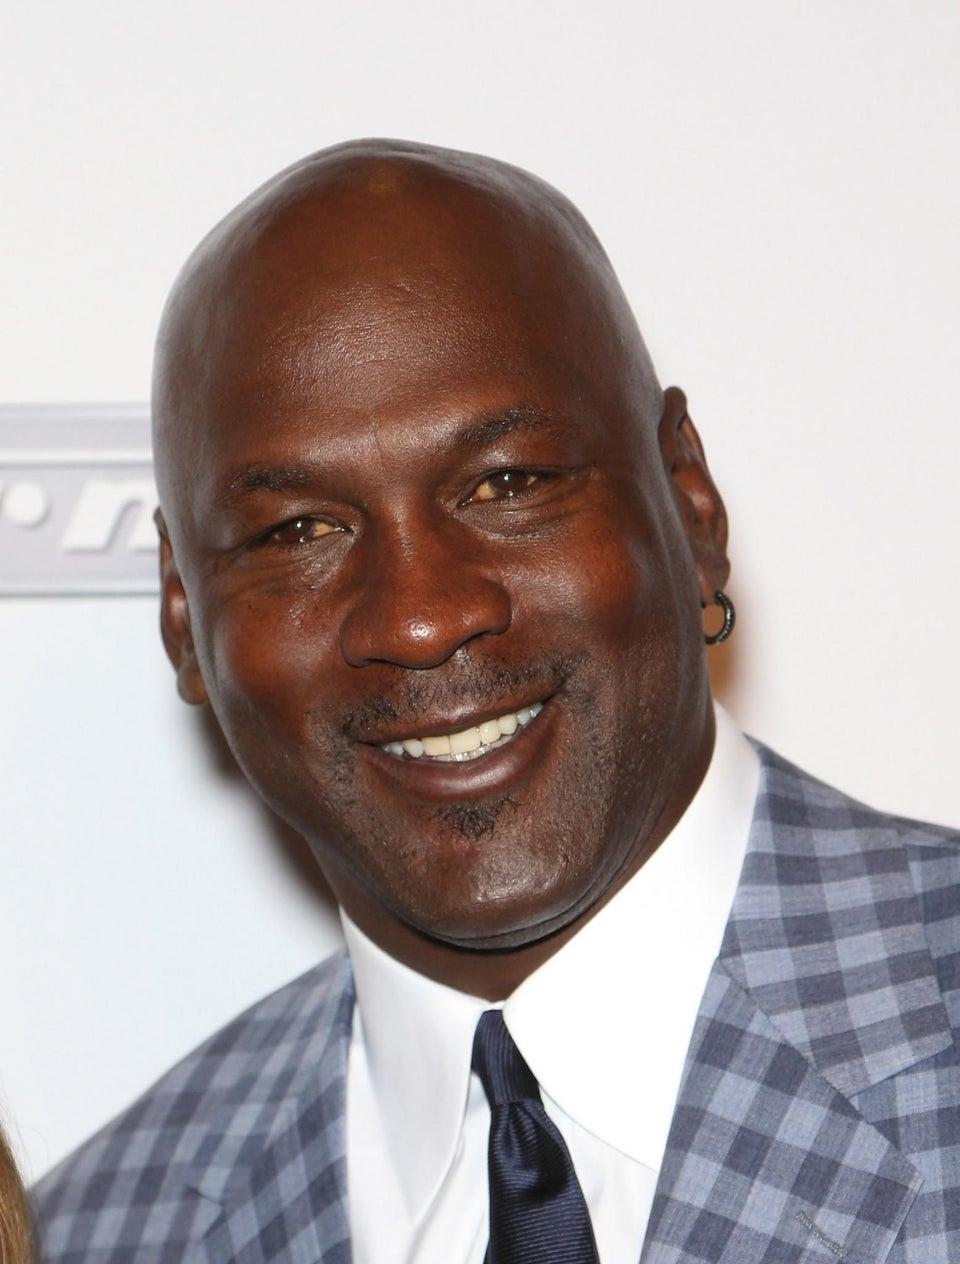 Michael Jordan Donates Money Won in Lawsuit to 23 Chicago Nonprofit Organizations